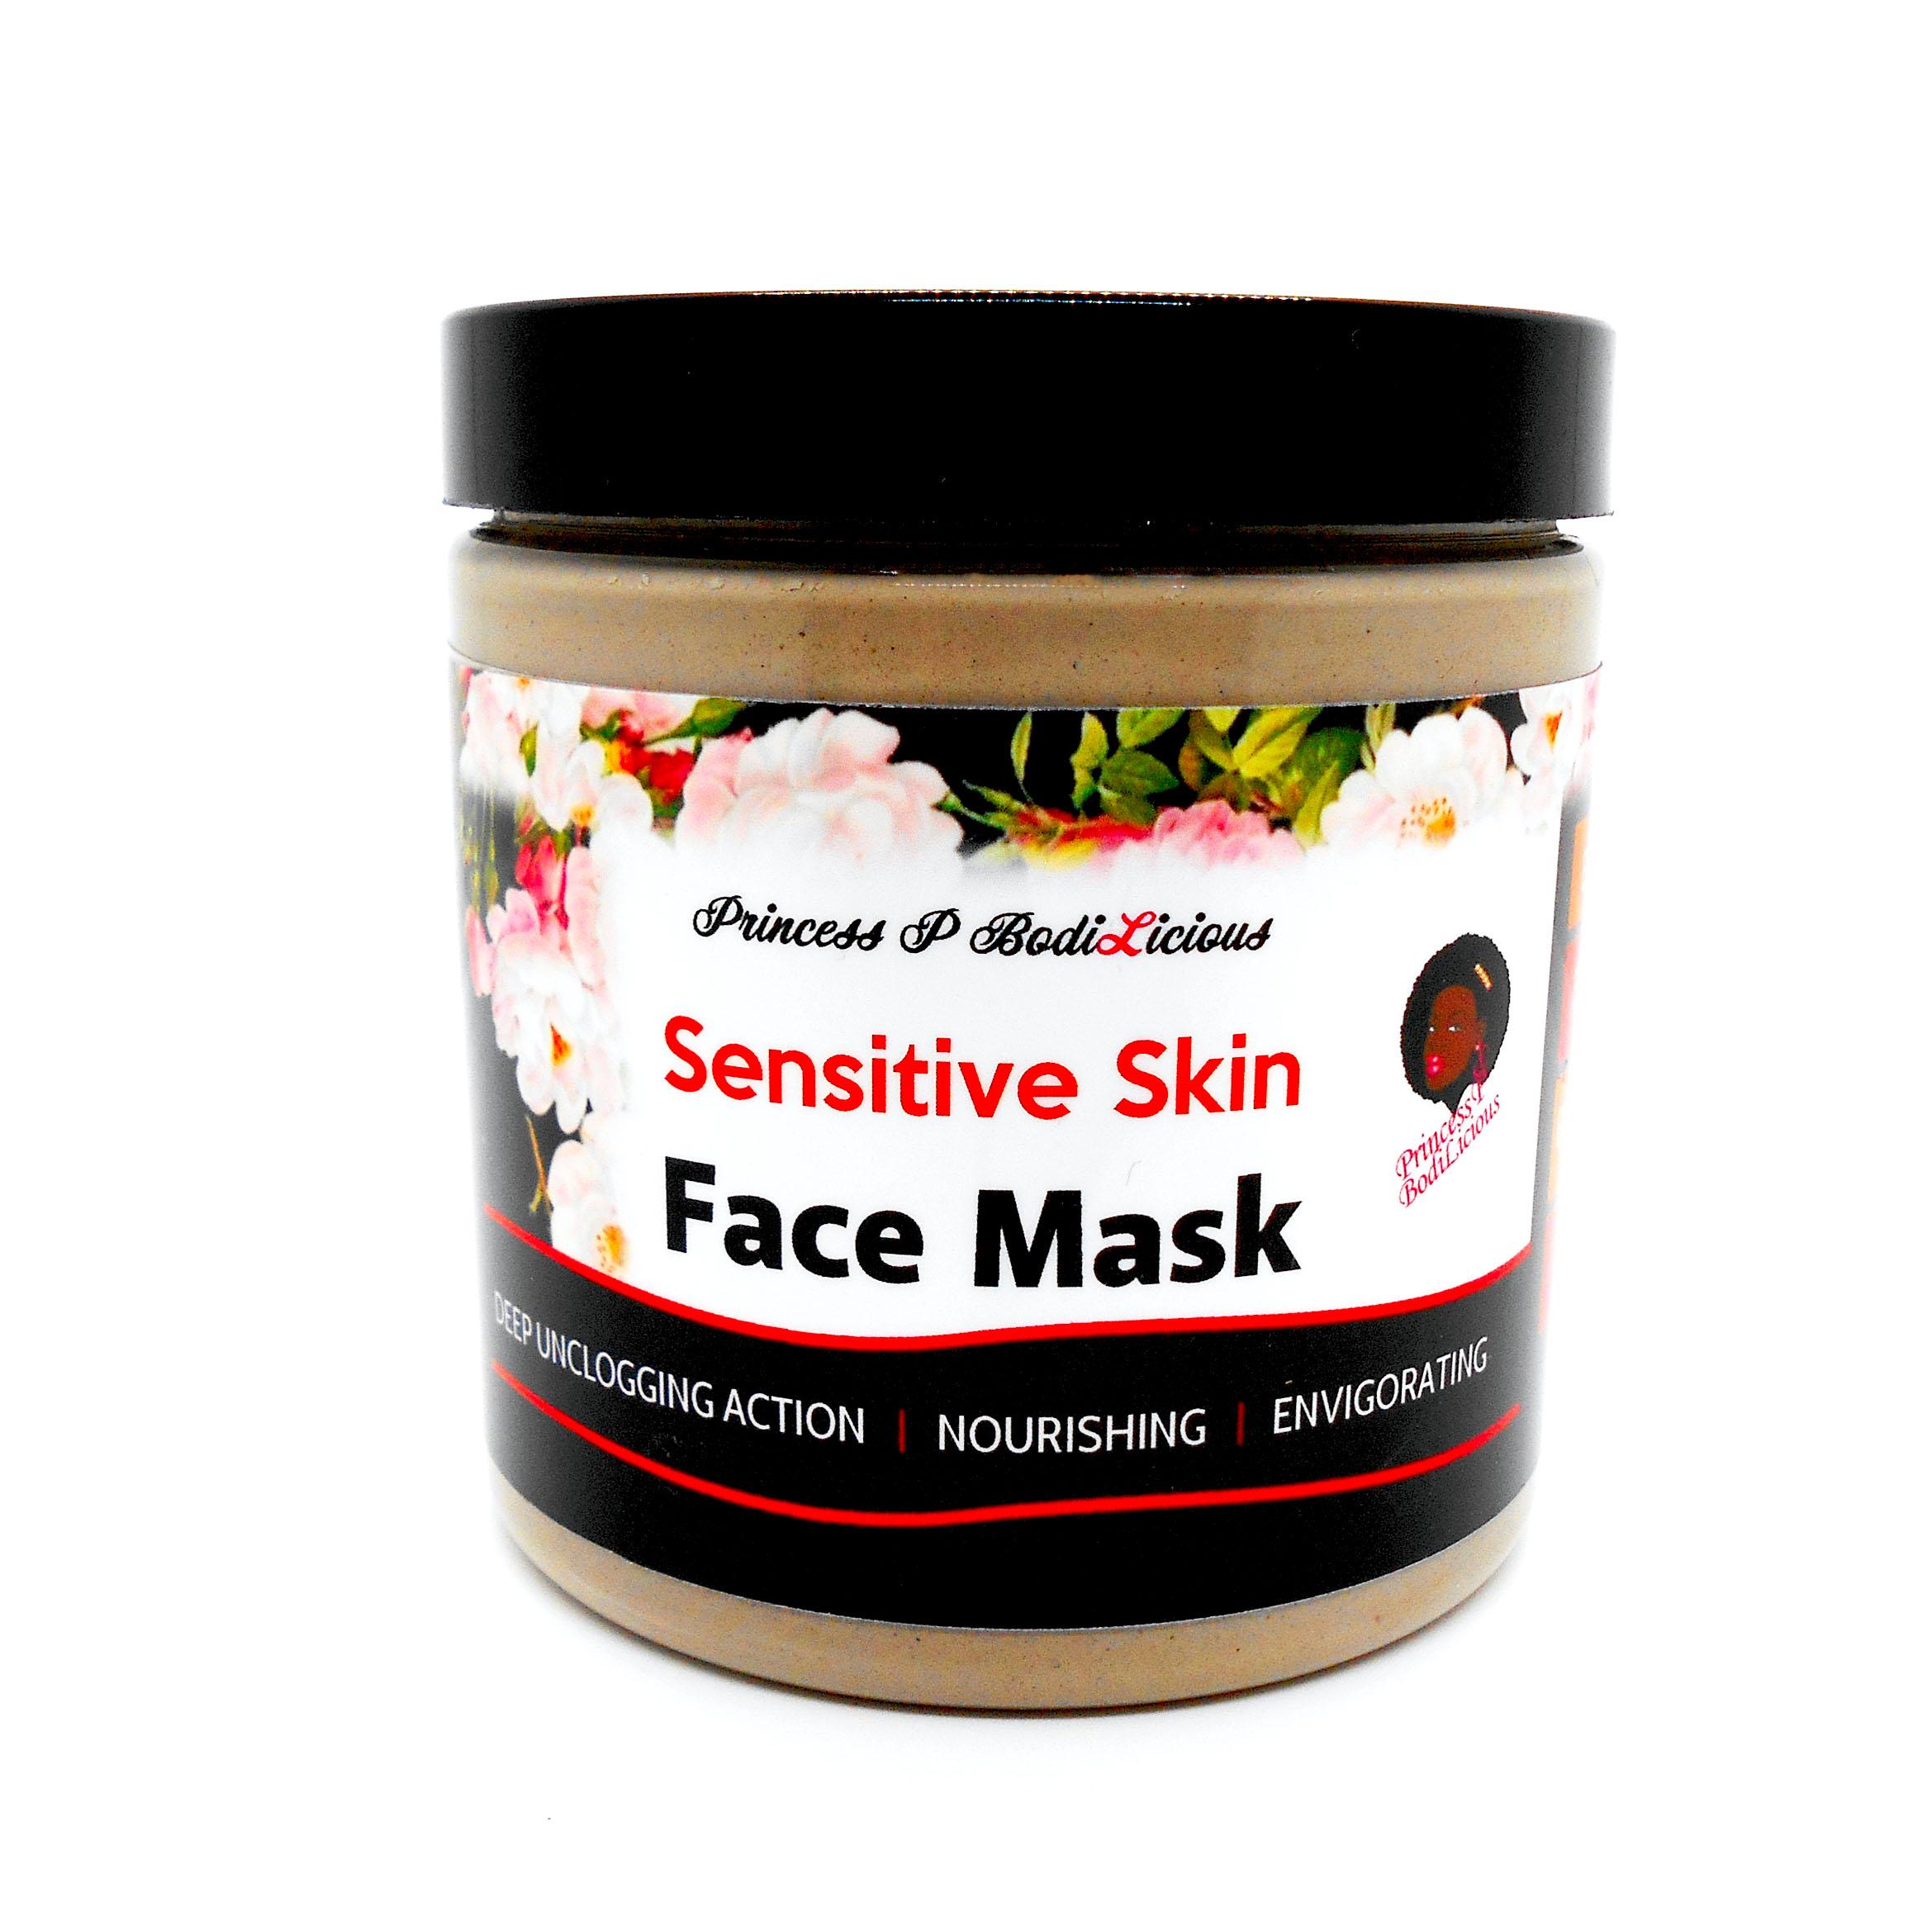 Sensitive Skin Face Mask